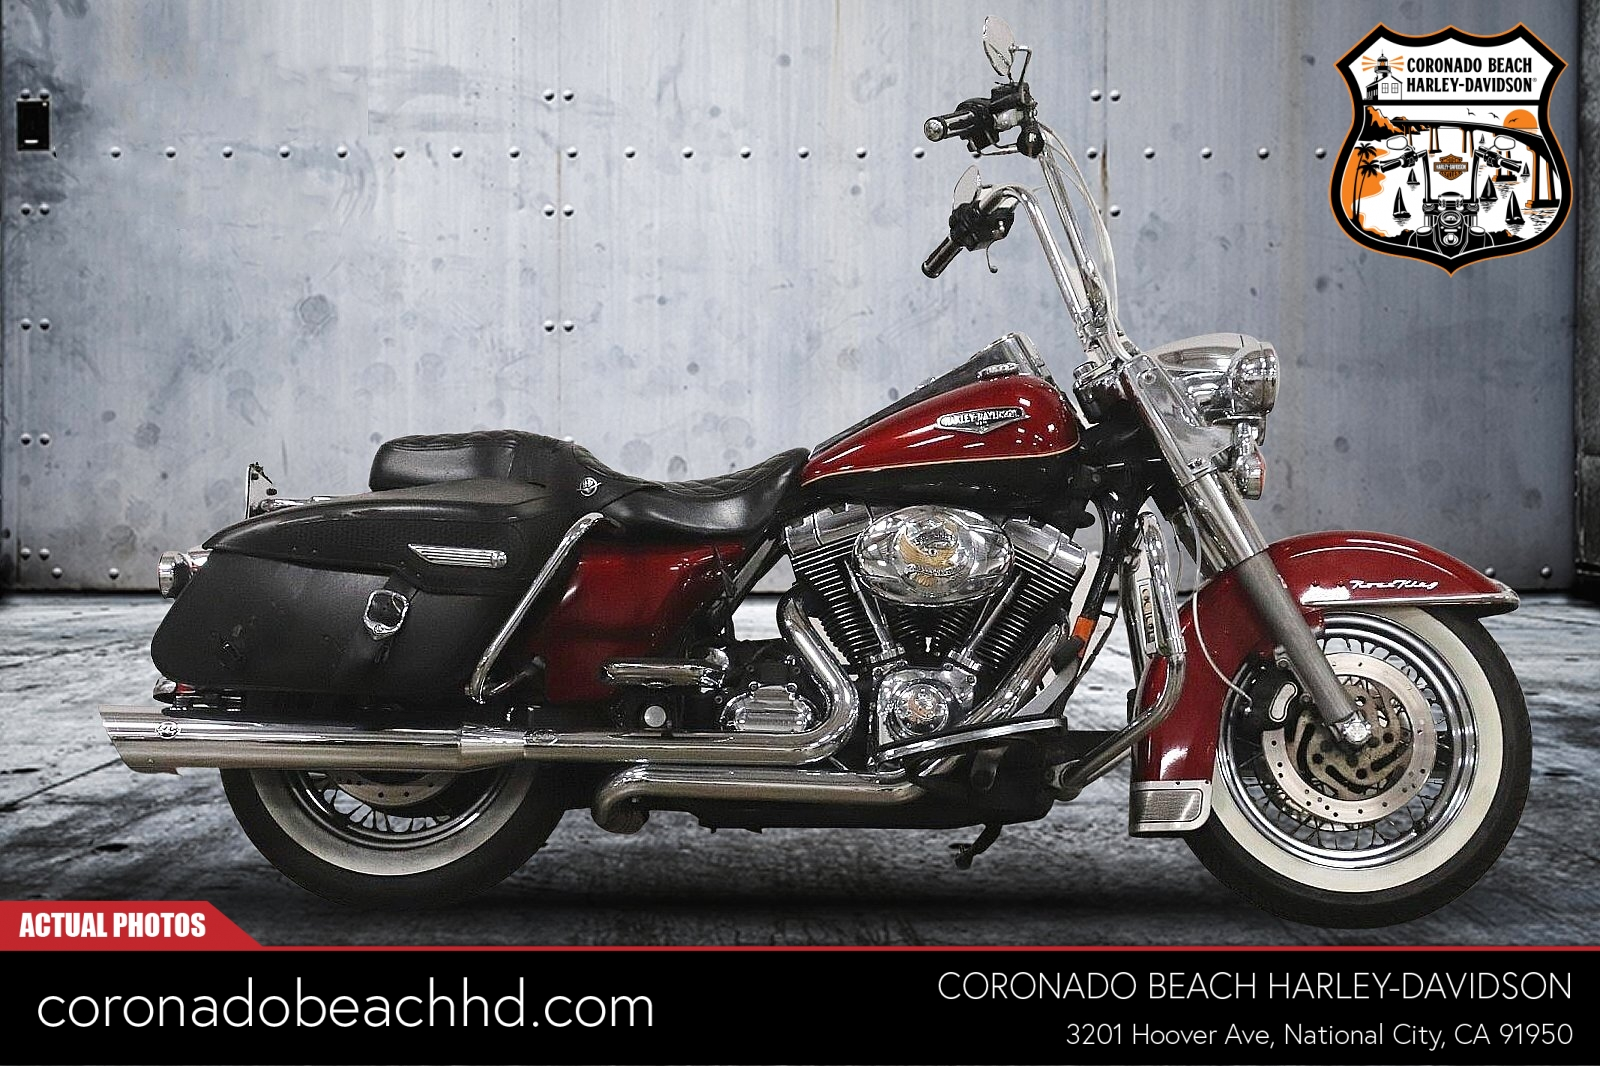 2007 Harley-Davidson Road King Classic [9]